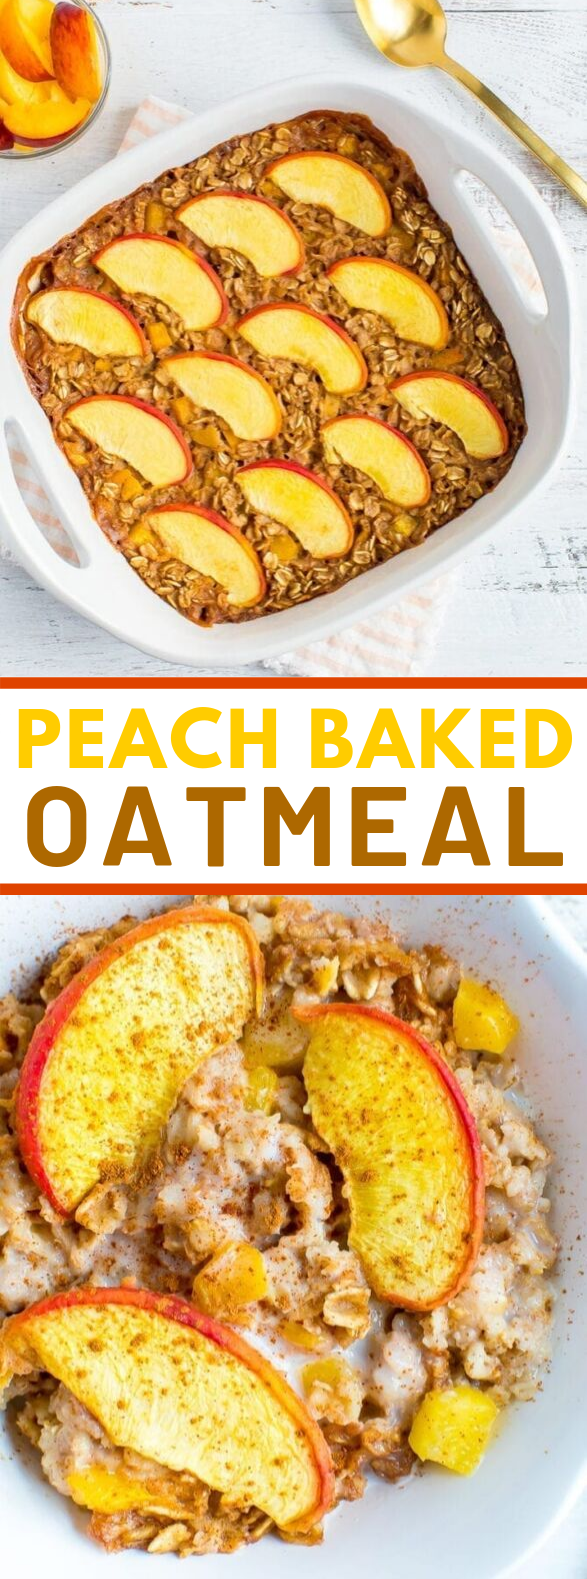 Peach Baked Oatmeal #dietrecipes #healthy